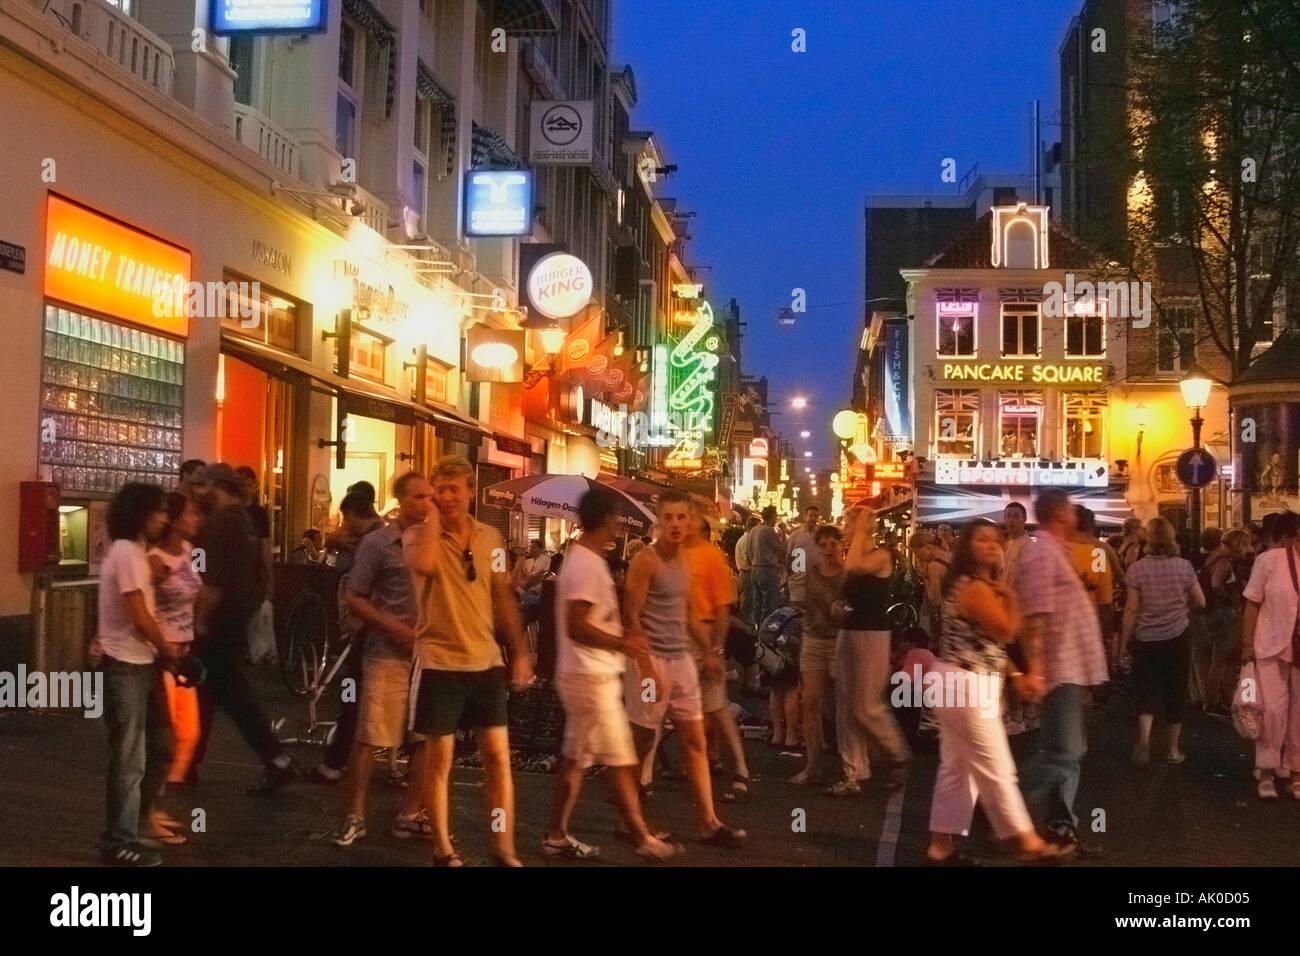 http://c8.alamy.com/comp/AK0D05/amsterdam-holland-leidseplein-nightlife-AK0D05.jpg